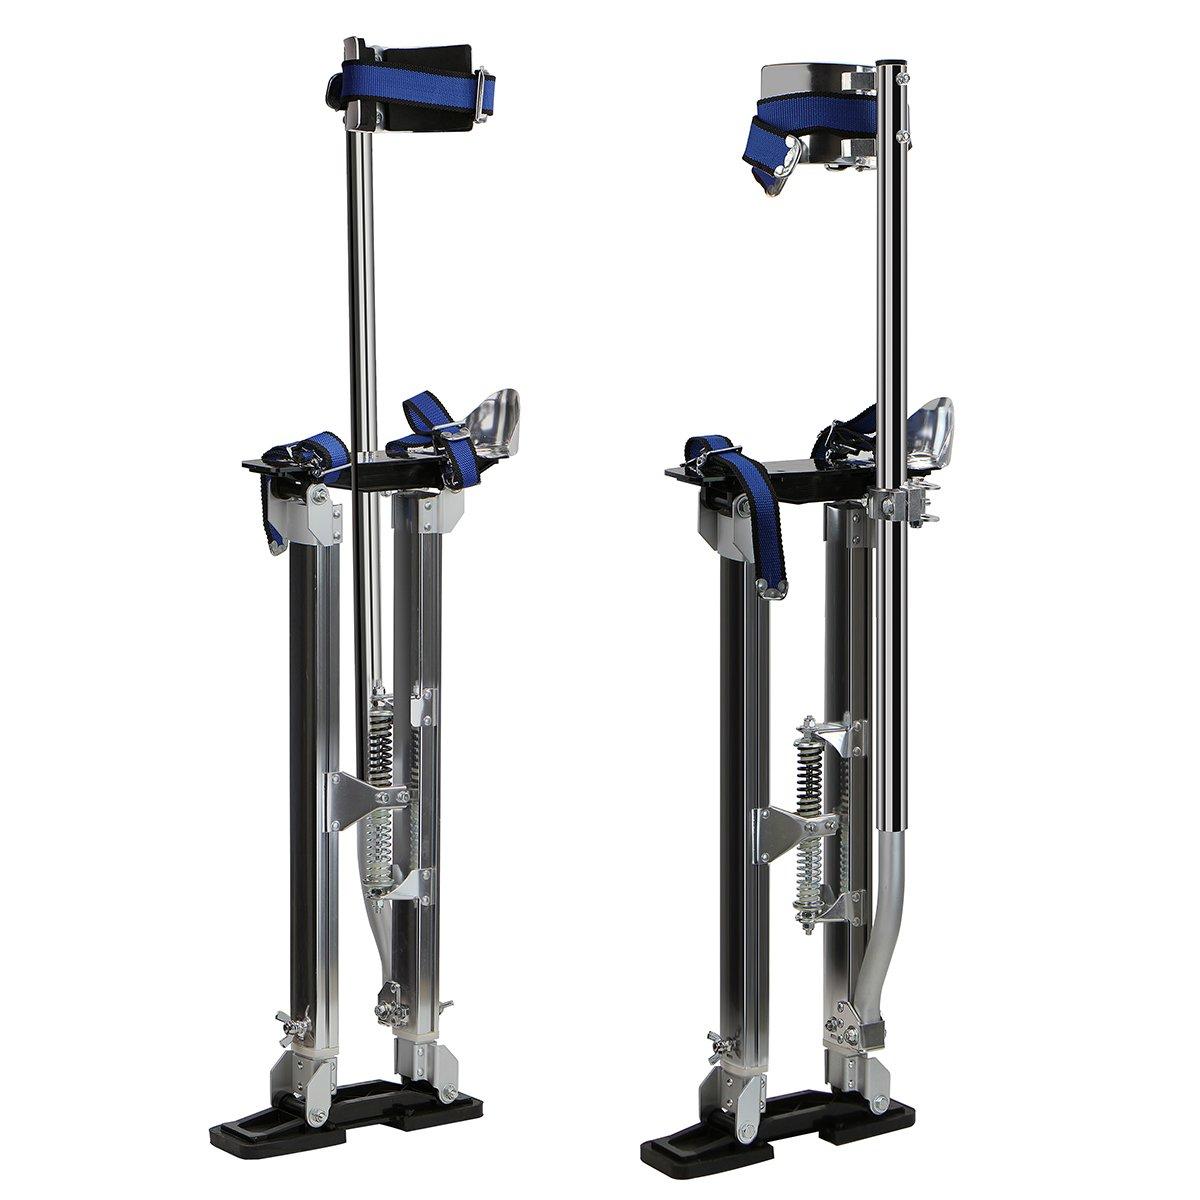 Drywall Stilts 24'' to 40'' Height Light Weight Non-Slip